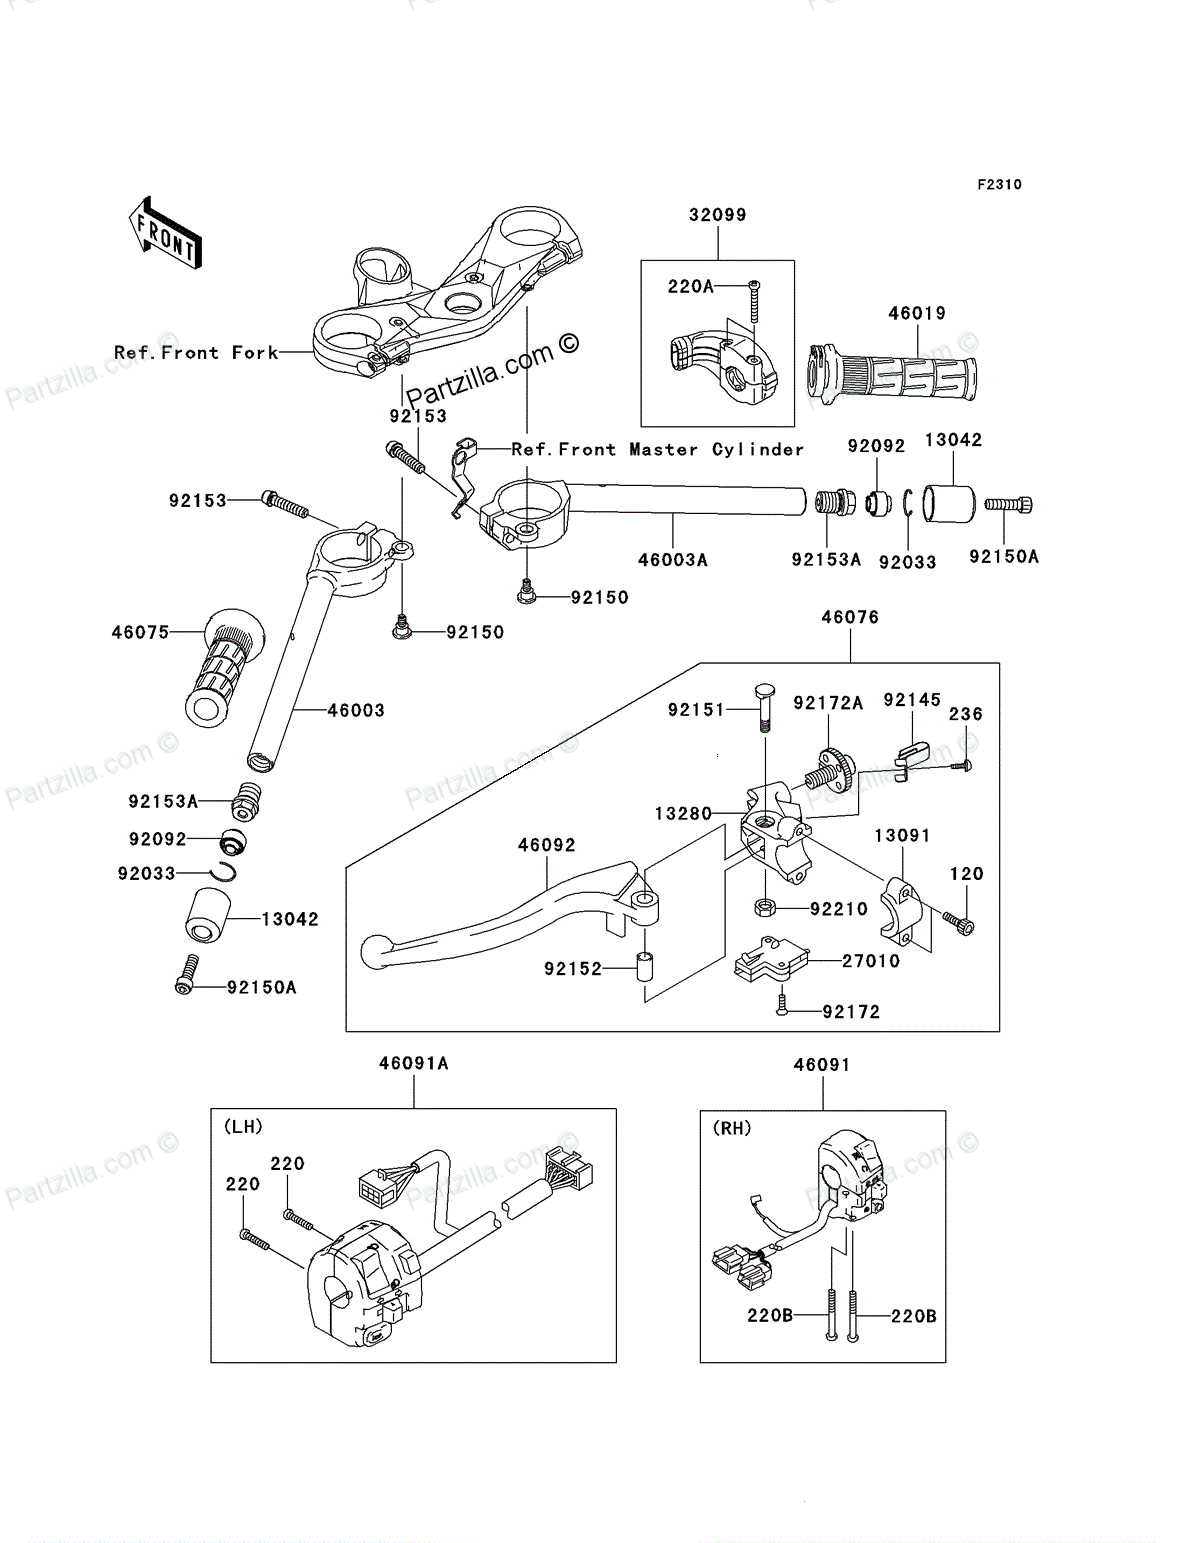 Semimanillar Derecho Kawasaki Zx 10r